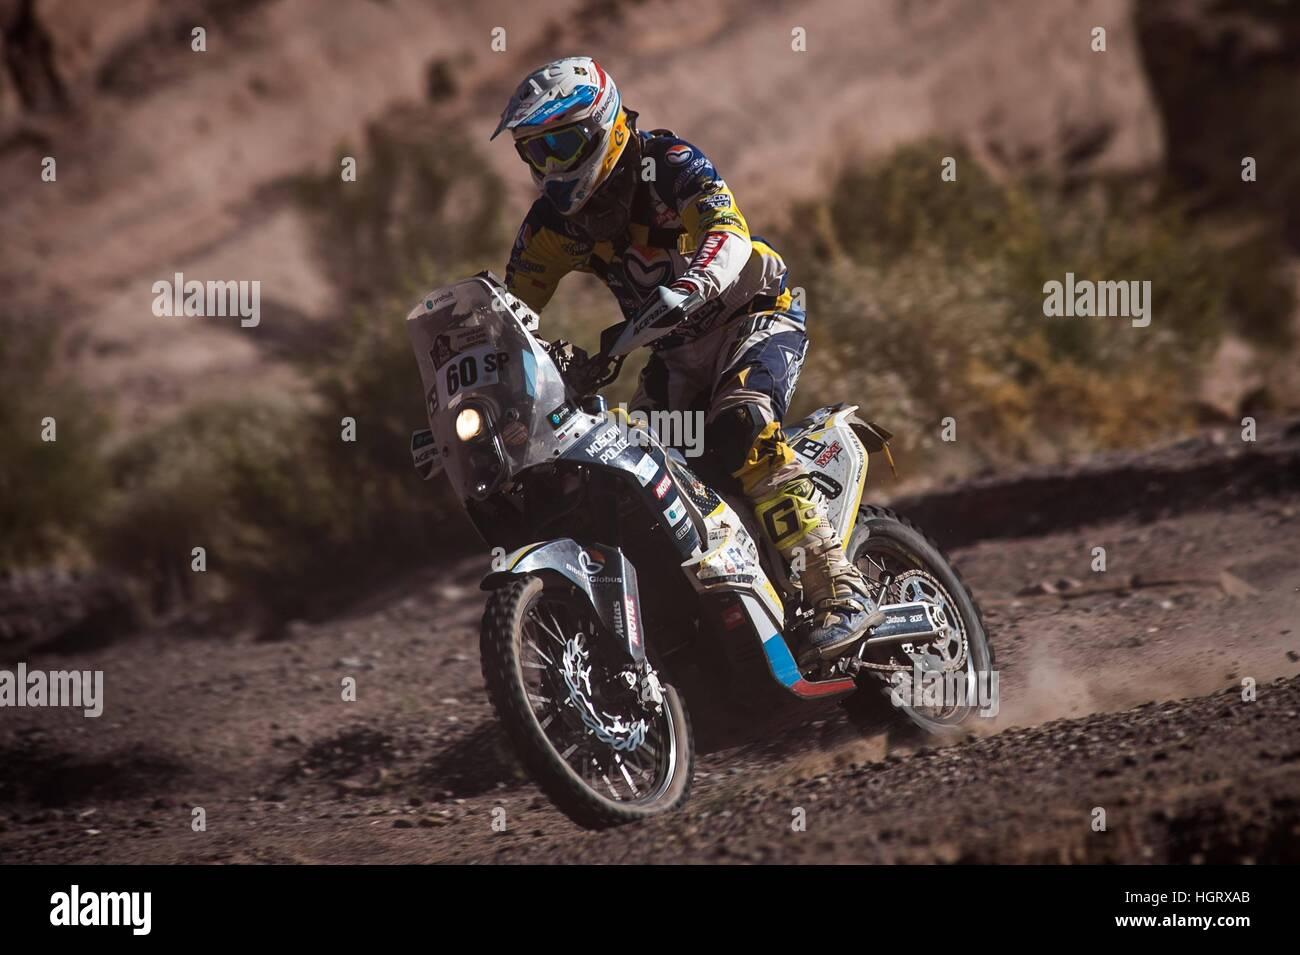 San Juan, Argentina. 12th Jan, 2017. 60 Ivanitun Aleksandr (RUS) Husqvarna during the Dakar Rally 2017. © Gustavo - Stock Image